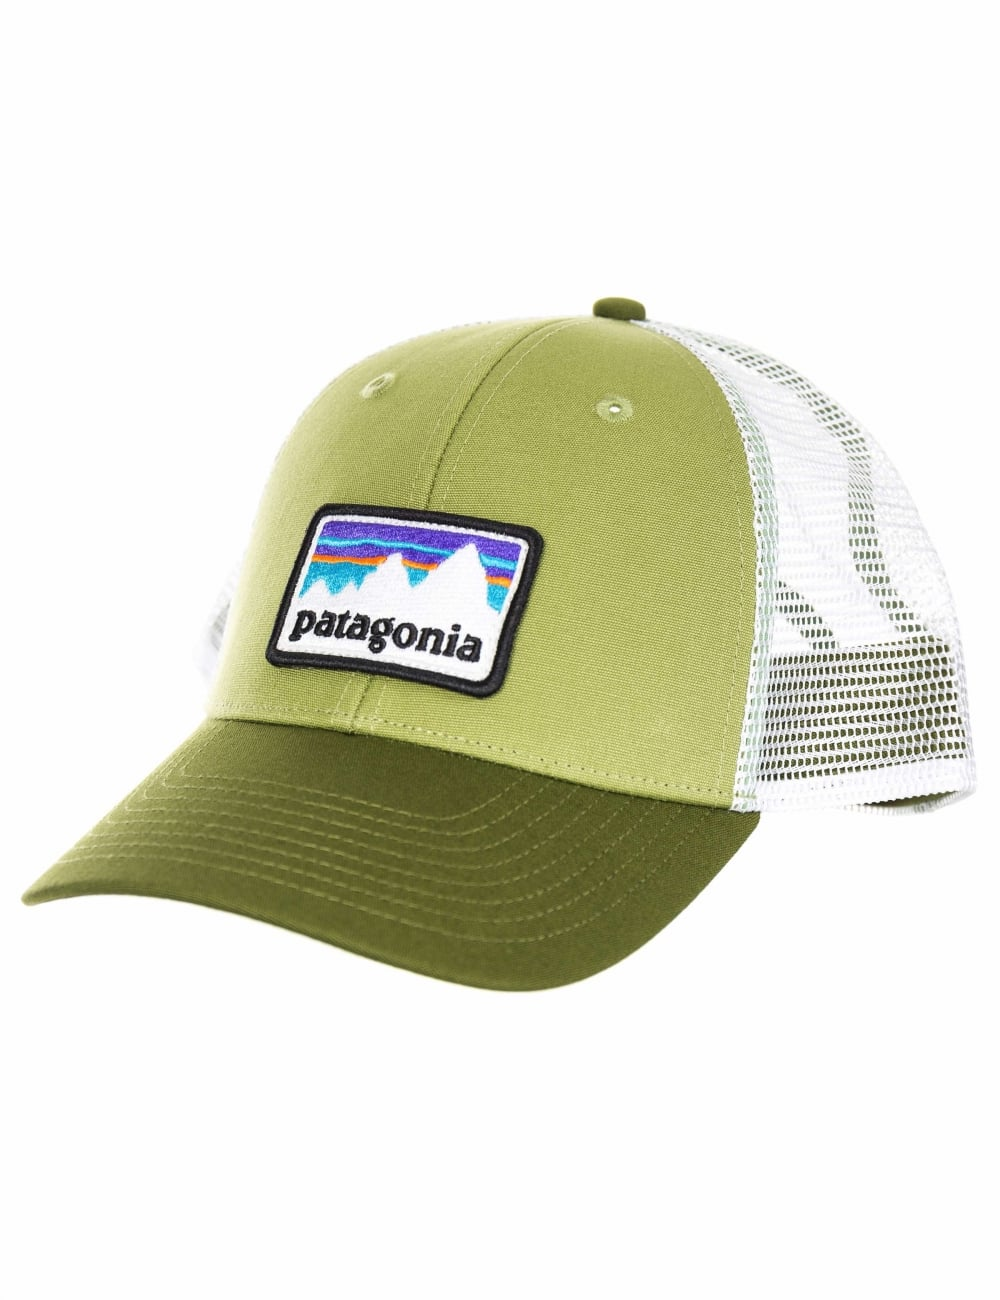 Patagonia Shop Sticker Patch LoPro Trucker Hat - Crag Green - Hat ... b22da4b46d0